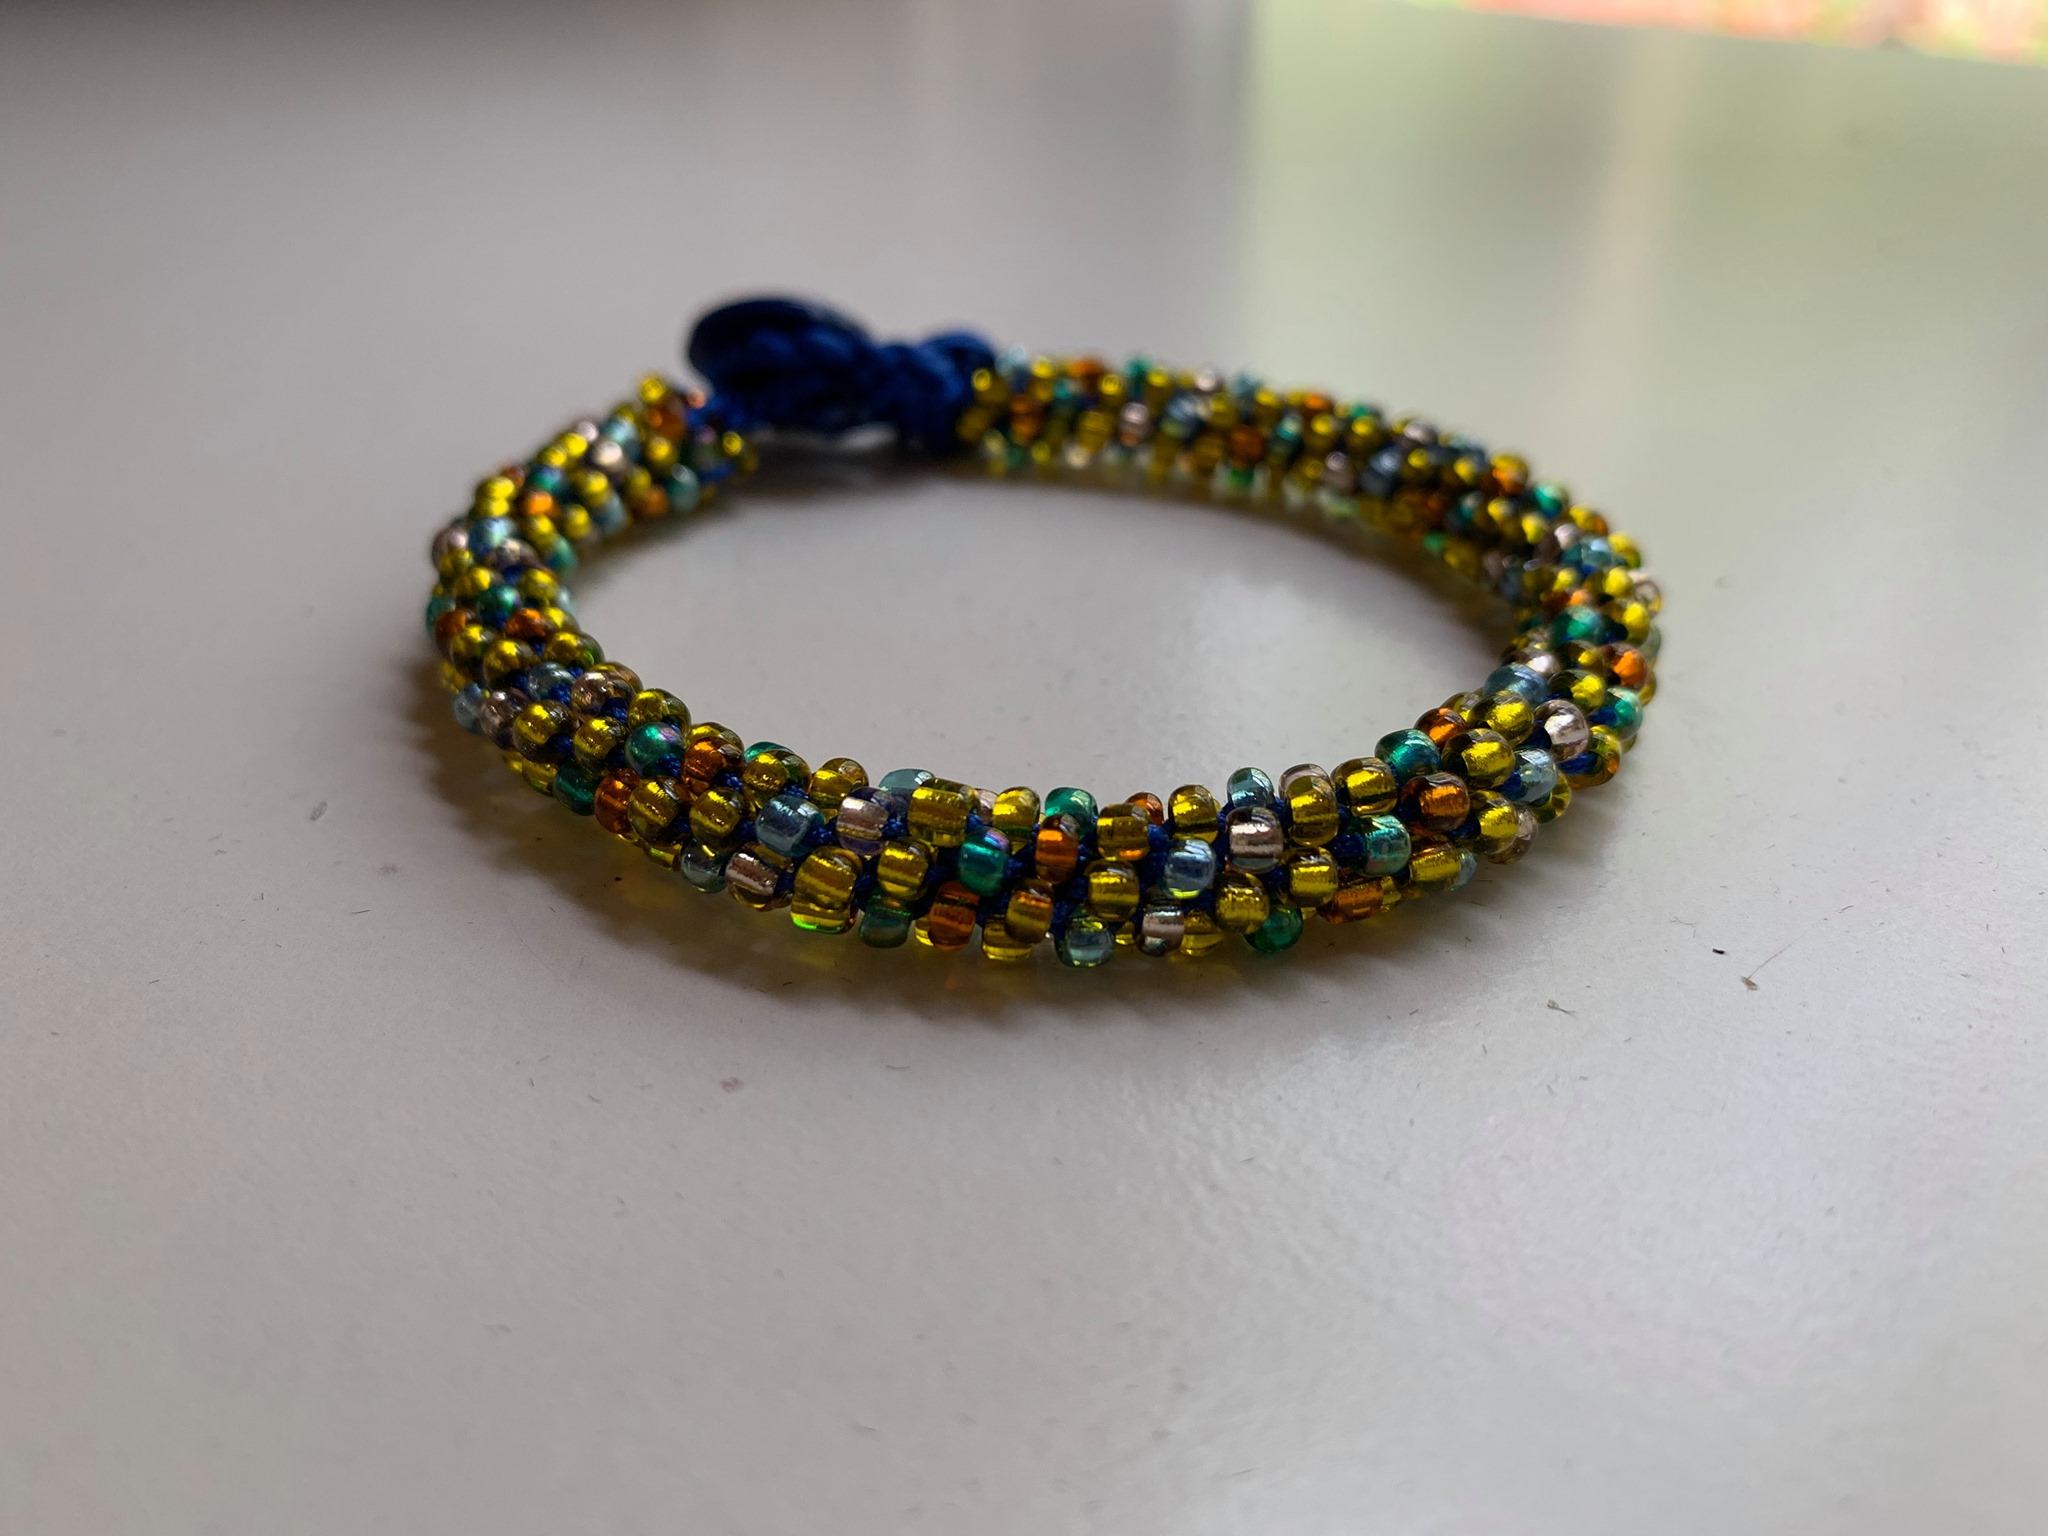 Paula Moyer - Can't Beat Color braided bracelet 1.jpg